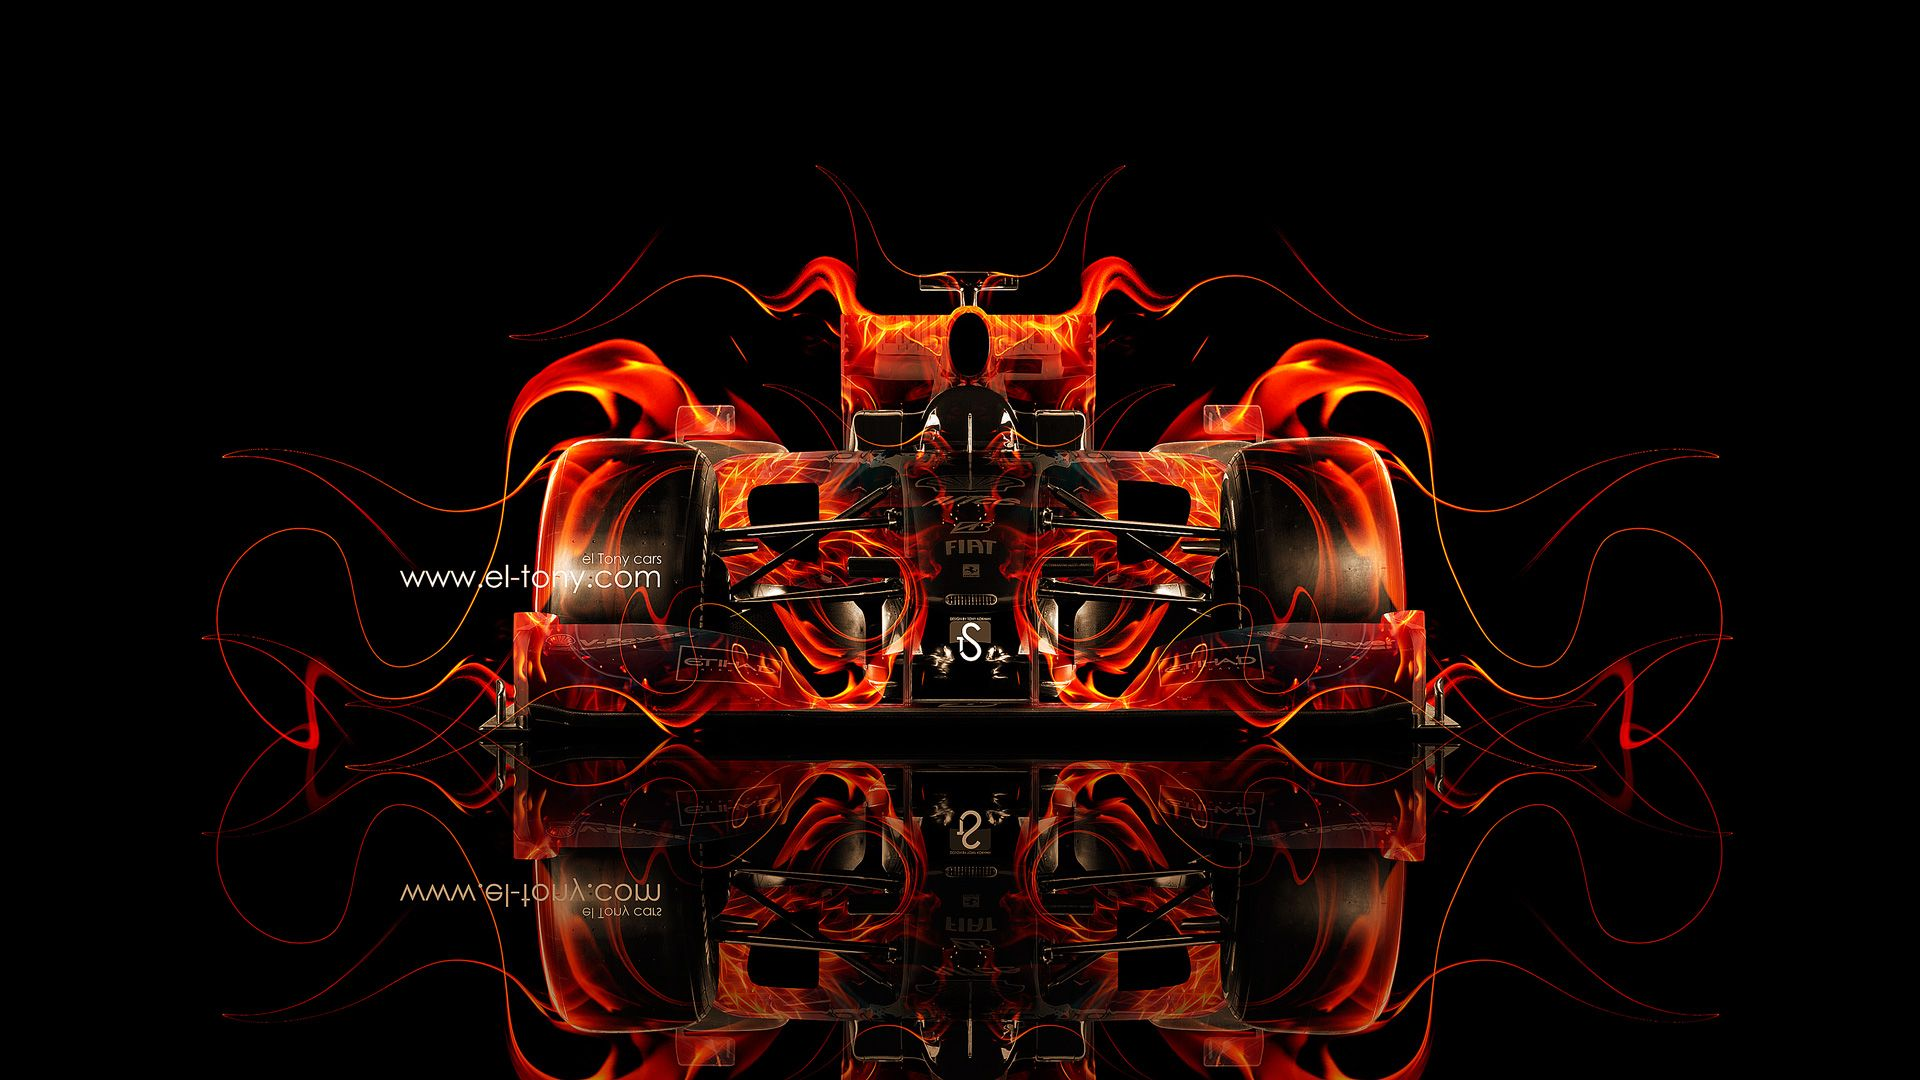 2014 F1 Car Design | ... Car 2013 Ferrari Enzo Side Fire Abstract Car